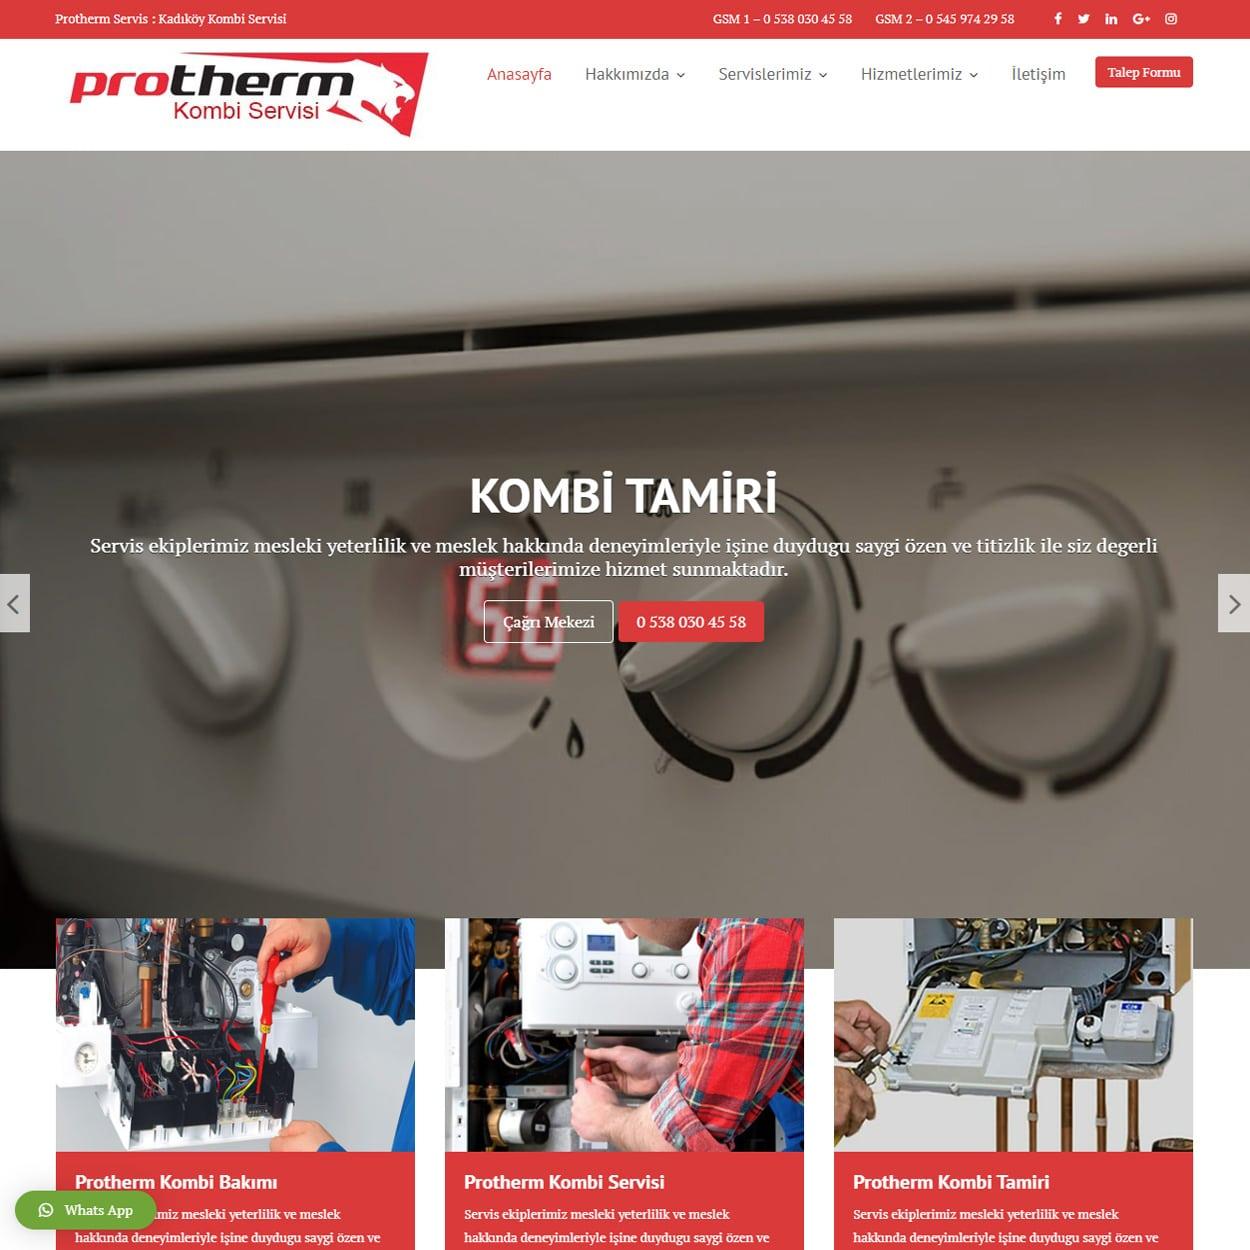 prothermkombi.net